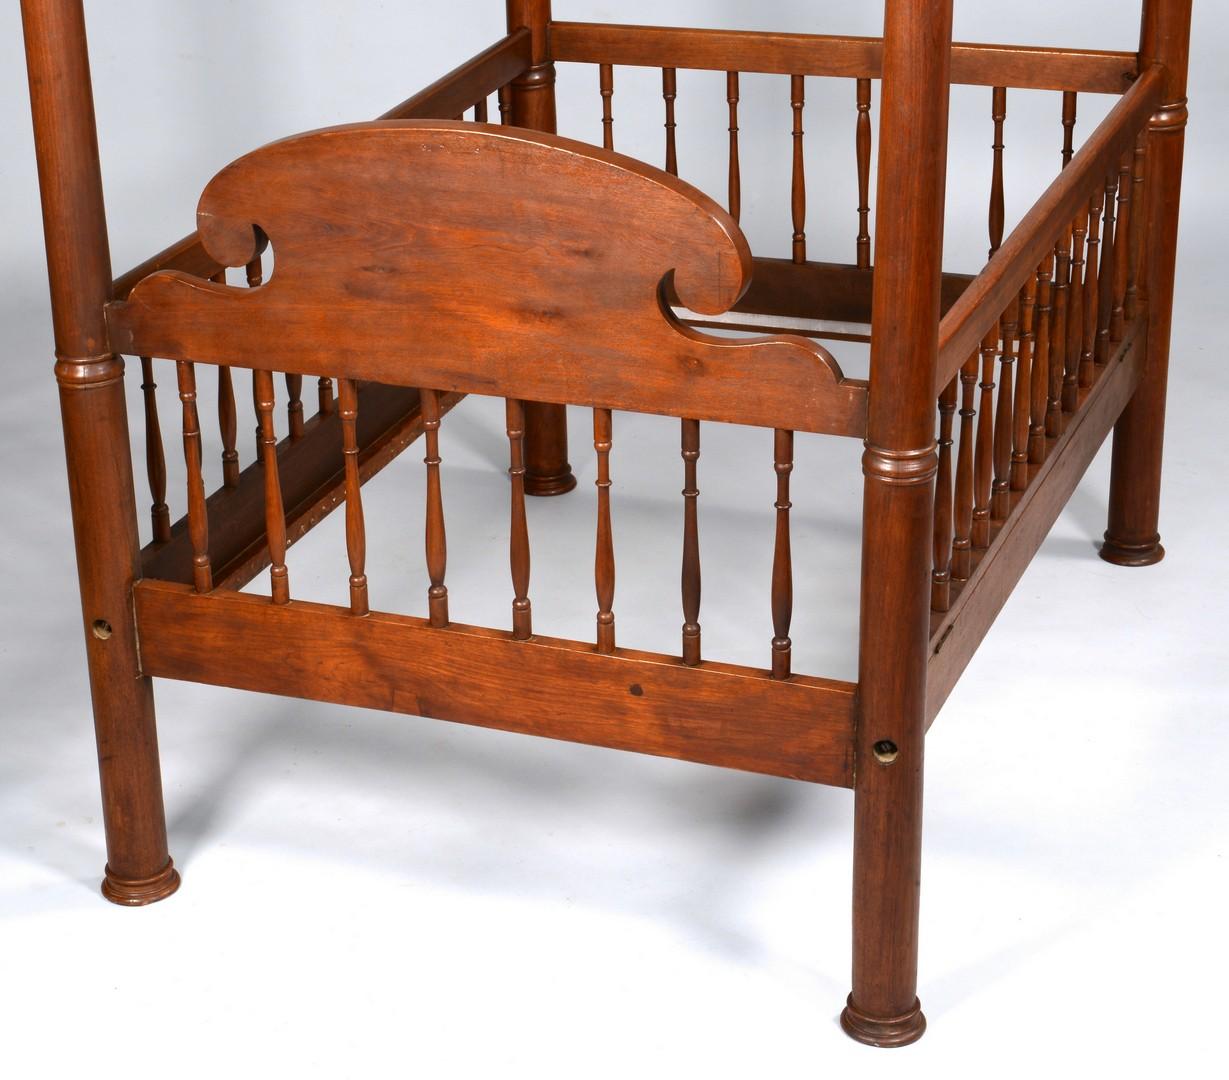 Lot 633: Renaissance Revival Child's Tester Bed